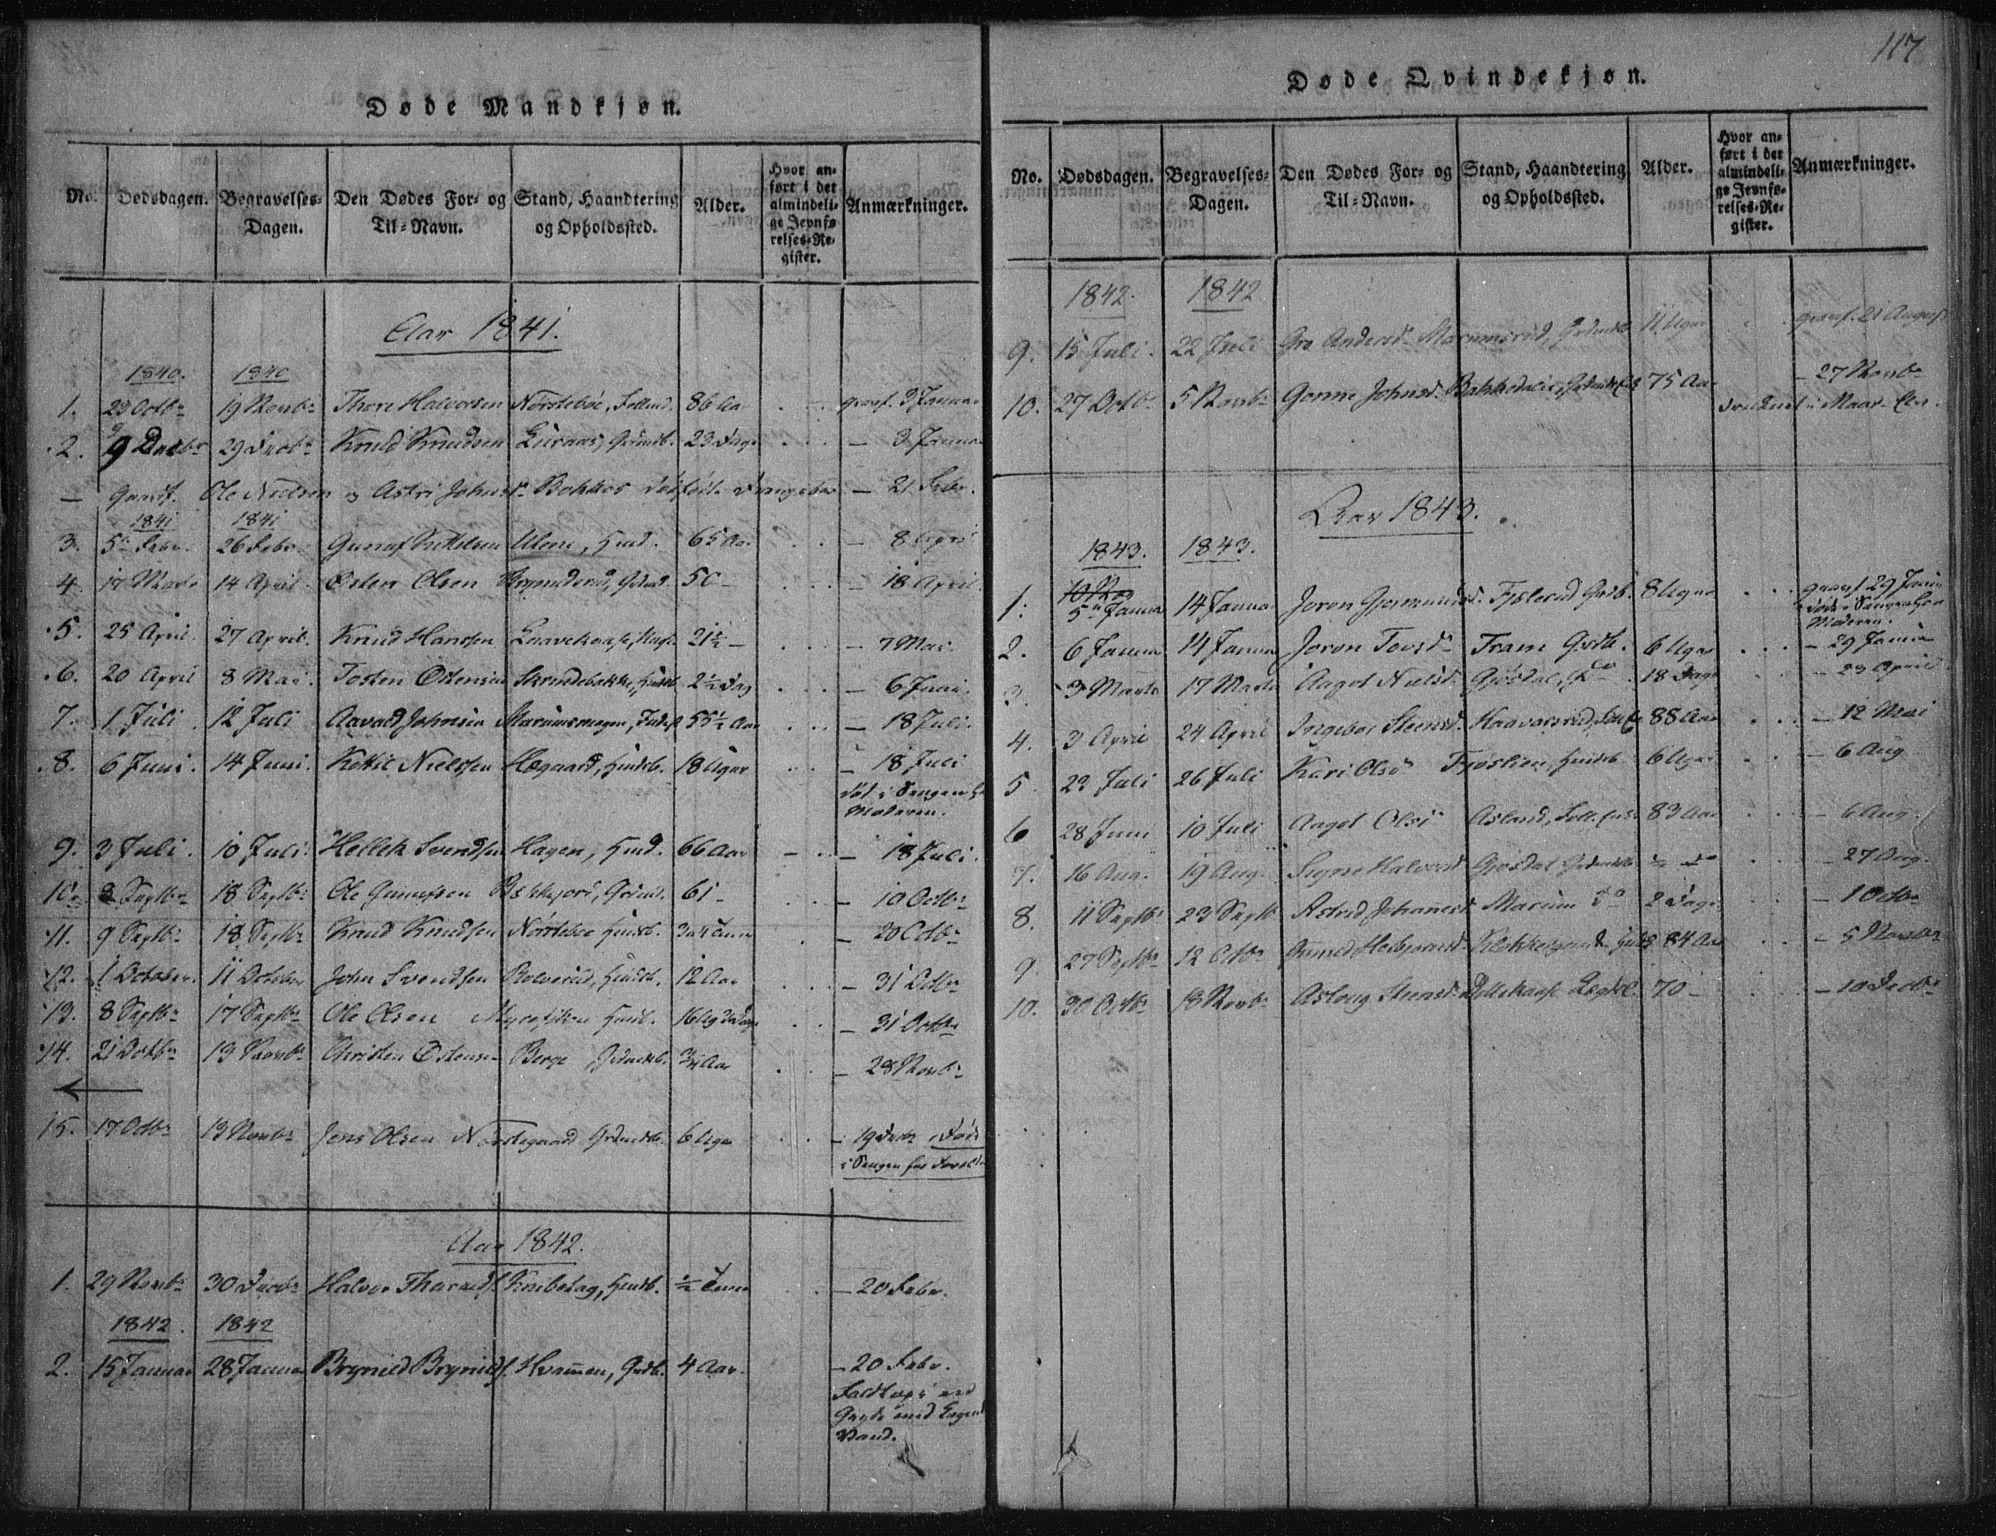 SAKO, Tinn kirkebøker, F/Fa/L0004: Ministerialbok nr. I 4, 1815-1843, s. 117